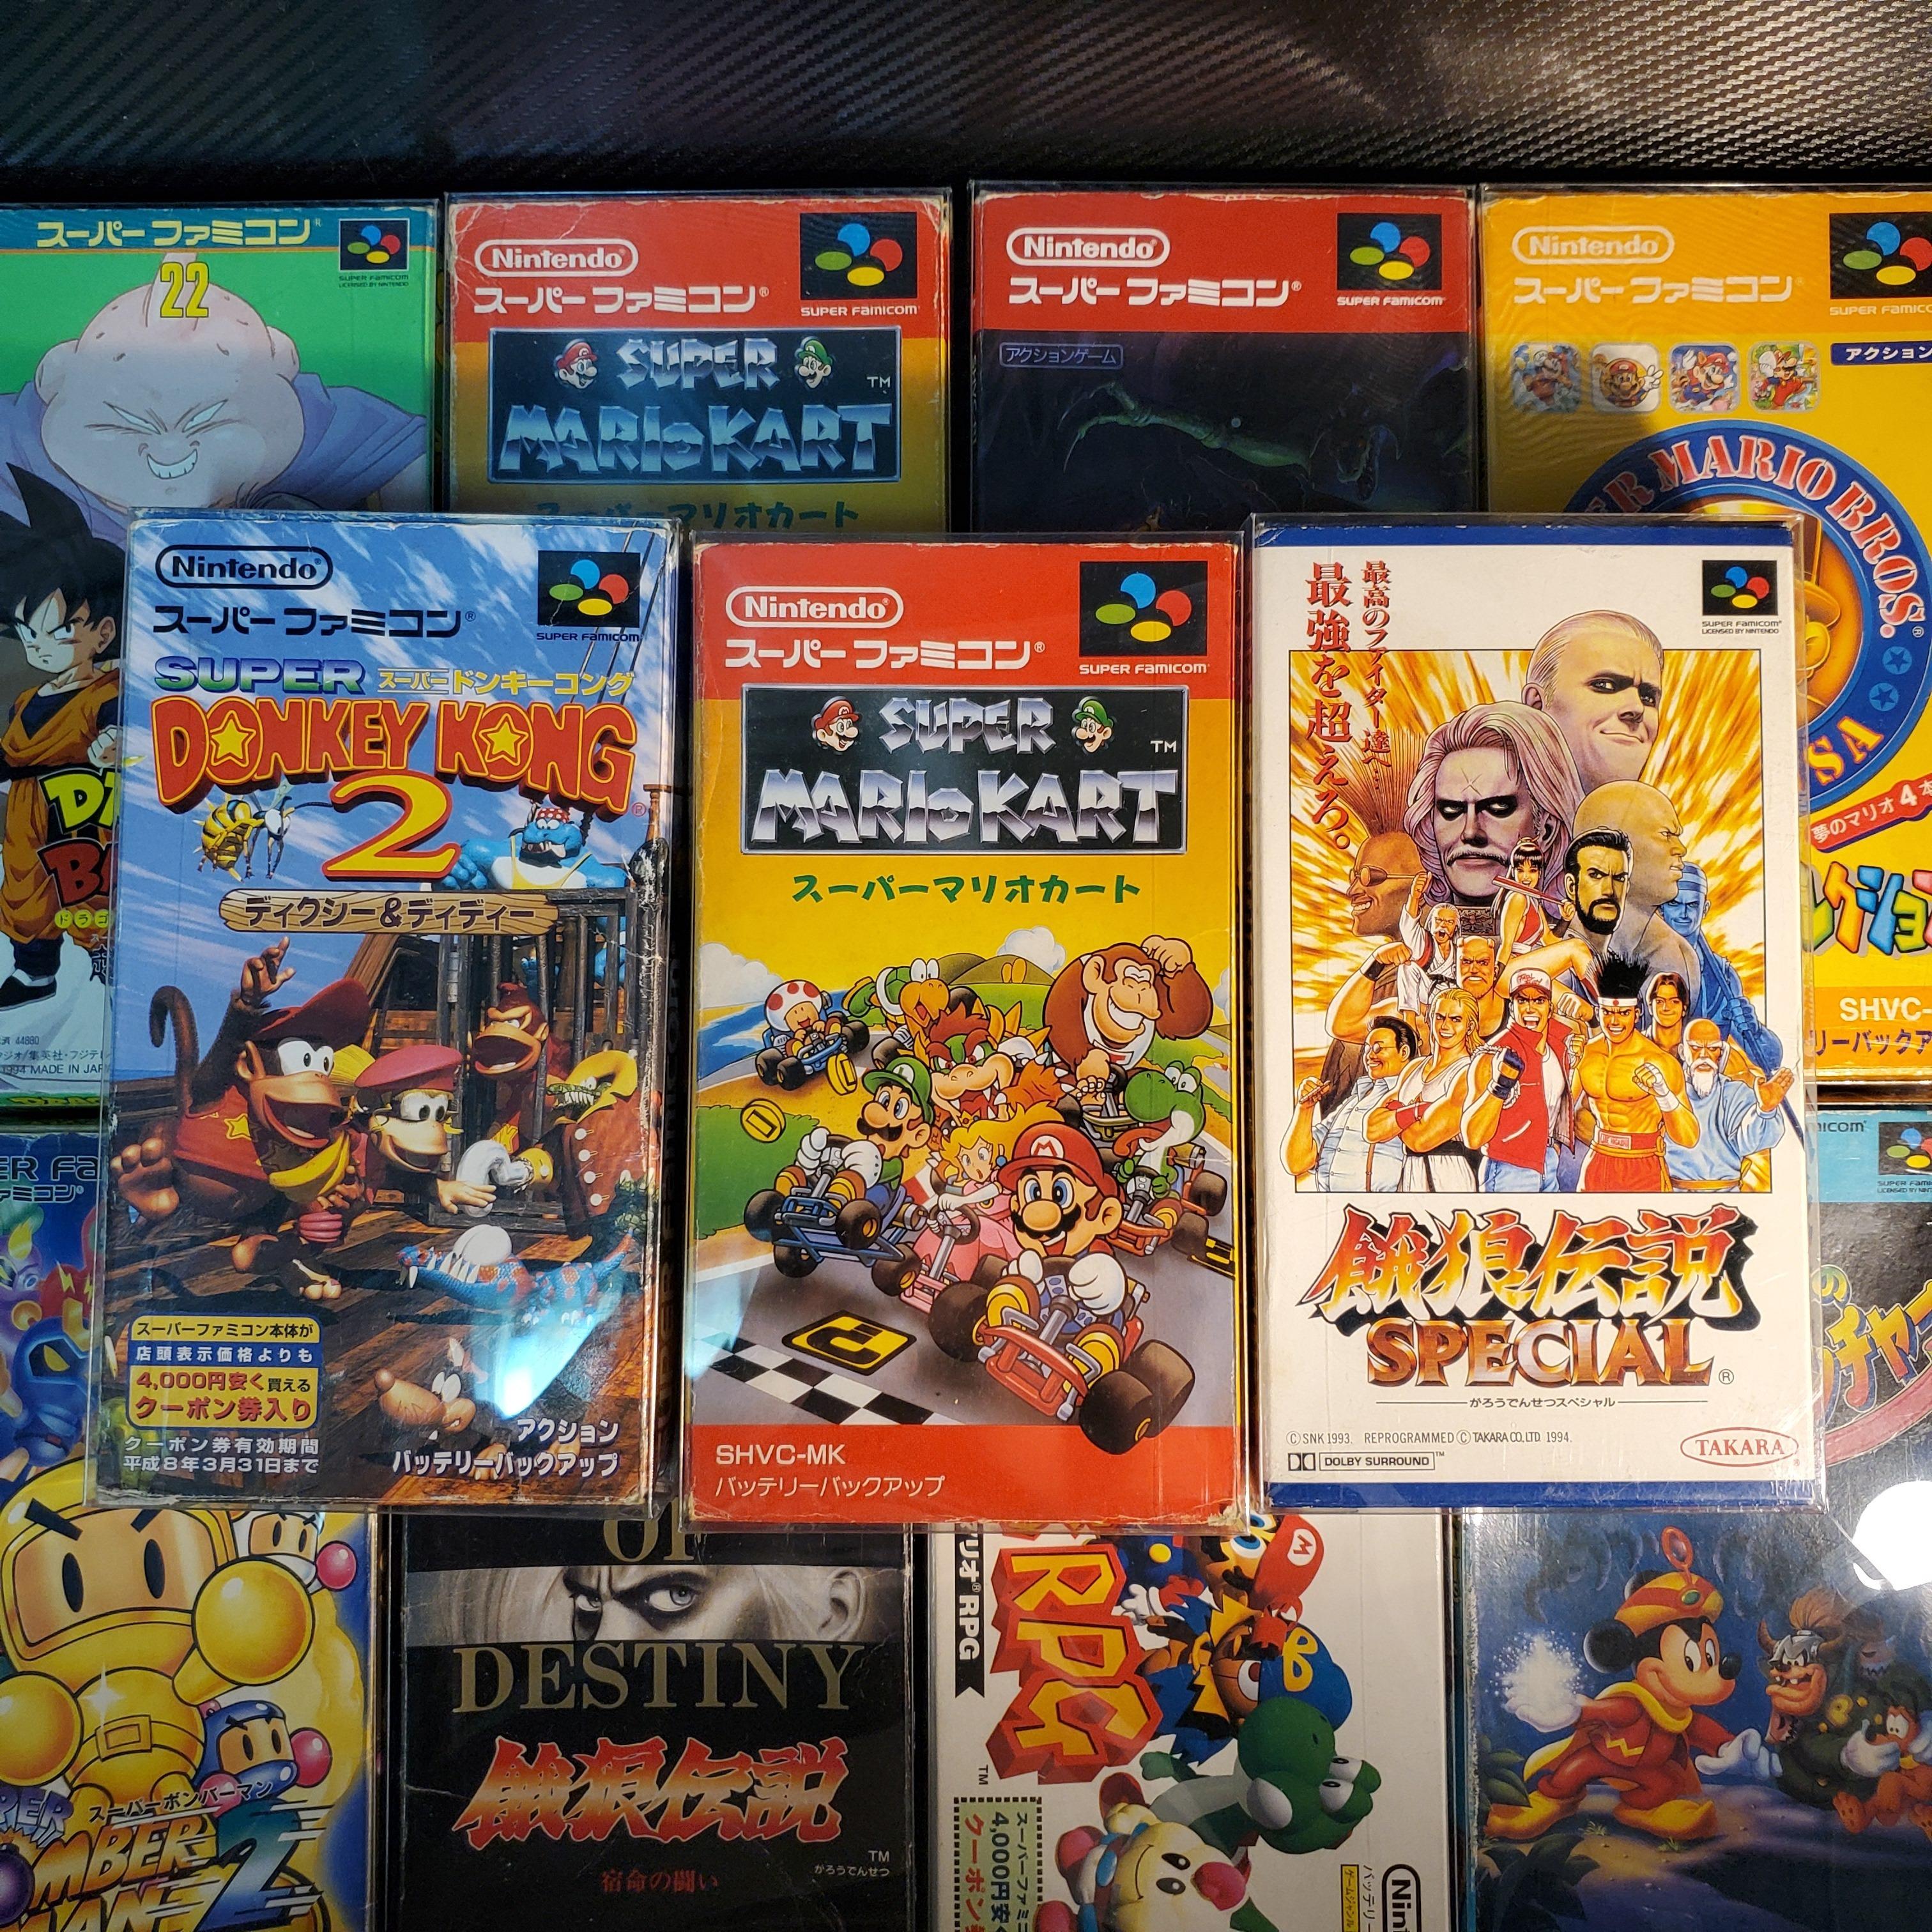 [VDS] Nostalgeek Store — Super Famicom / GBA / GB / Nintendo 64 / GameCube 201005104659853870